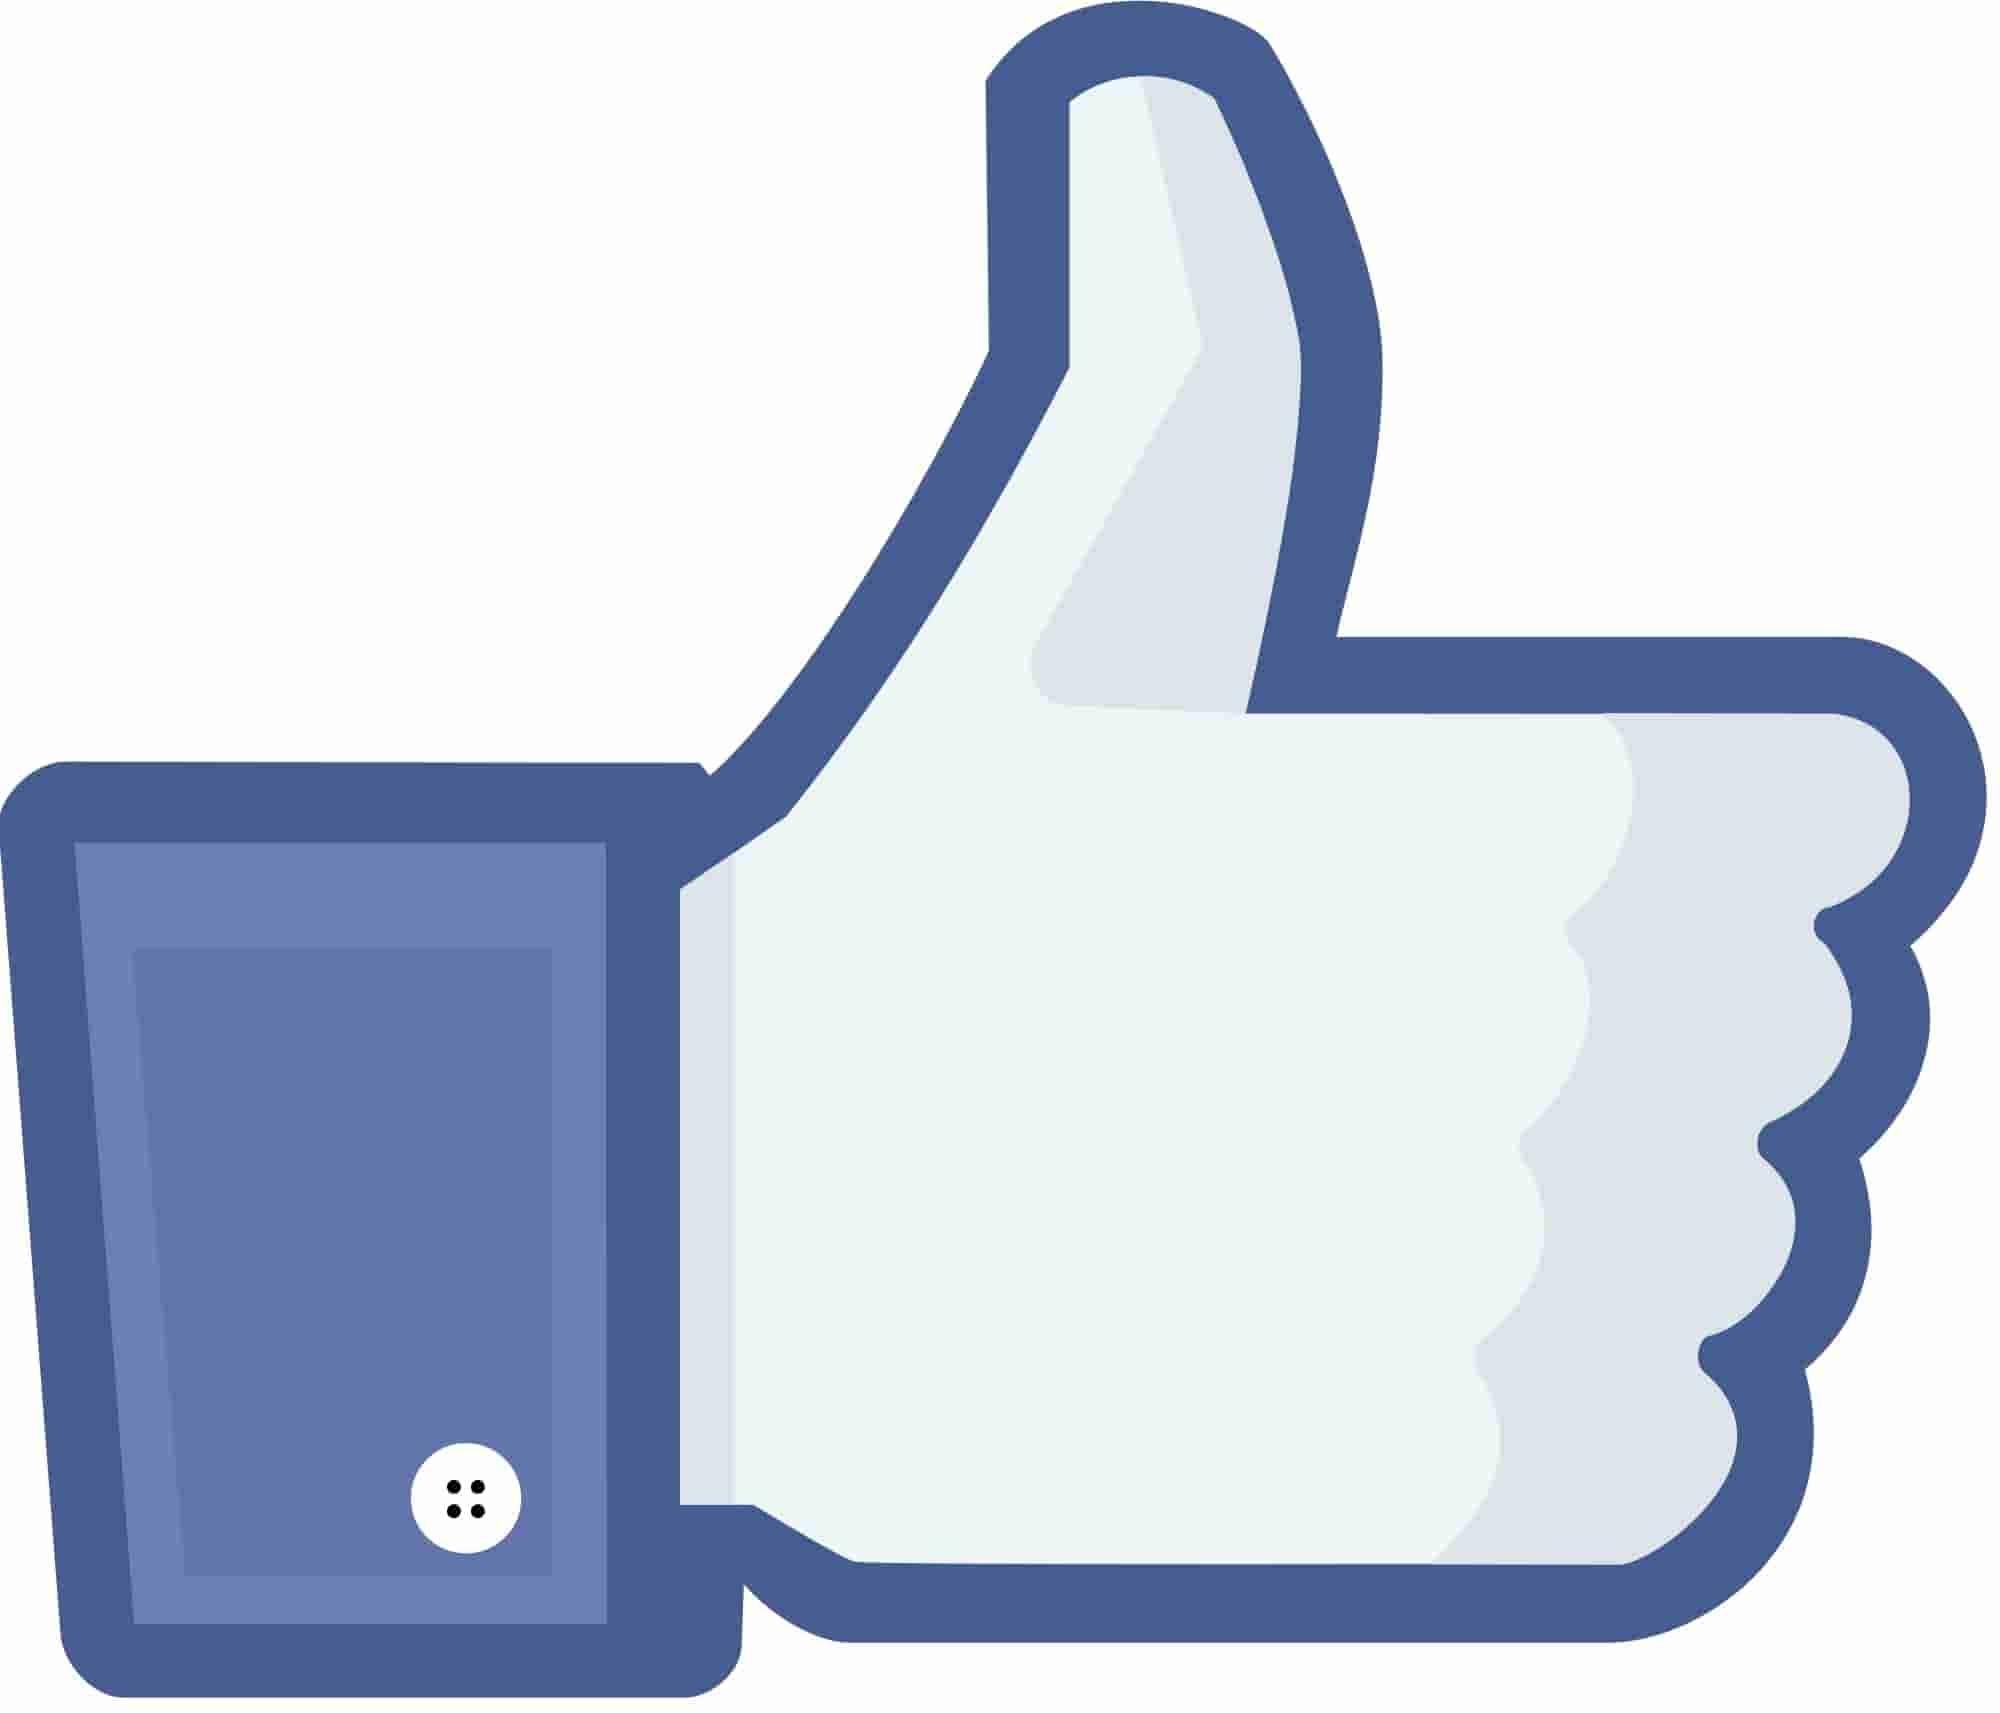 The Hair Growth Formula Com Aff Id 3350 Subid Regrowhair0229regrowhair 1144189281 Social Media Advertising Facebook Likes Model Ships